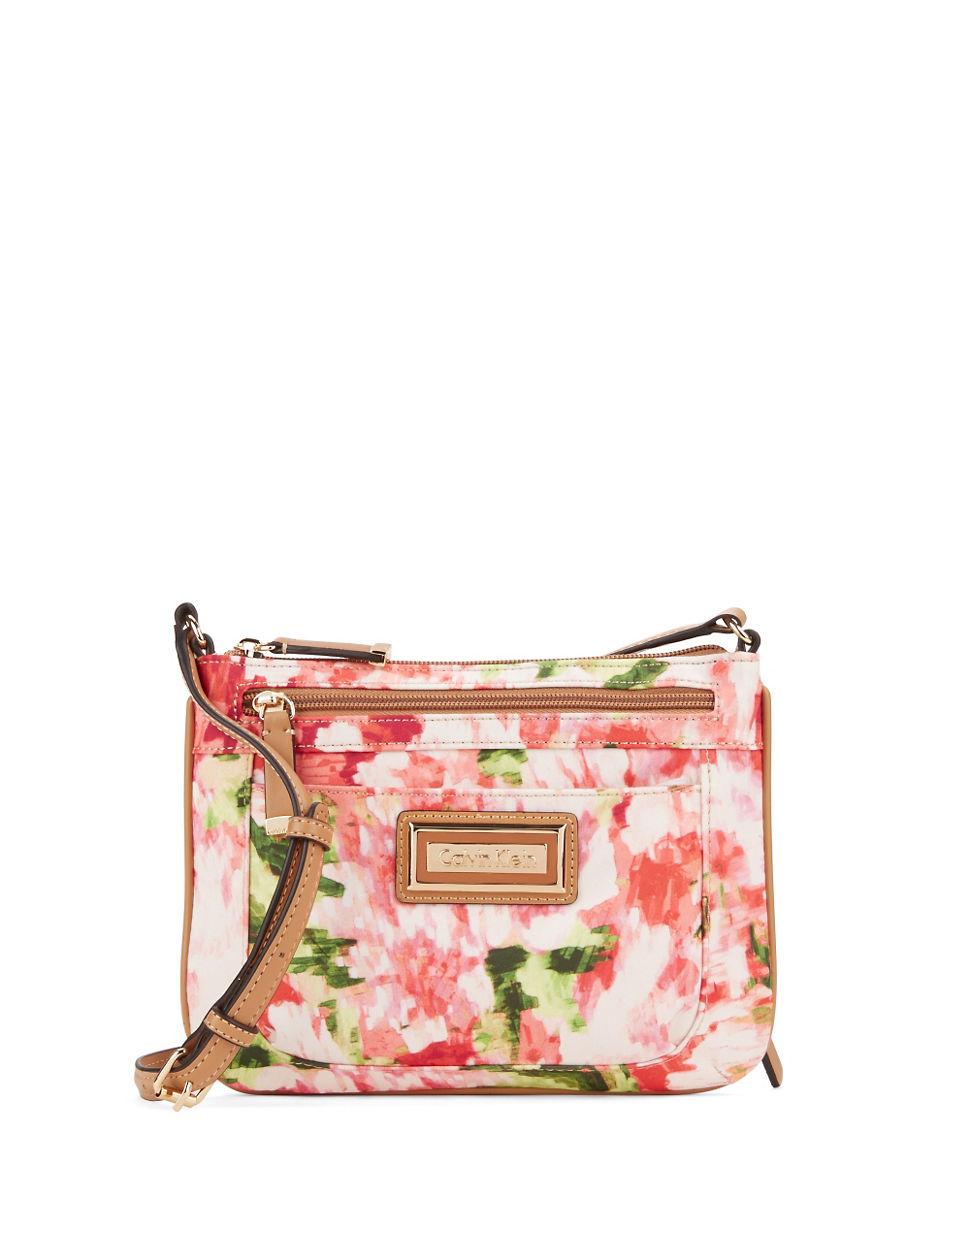 Lyst - Calvin Klein Crossbody Bag In Pink